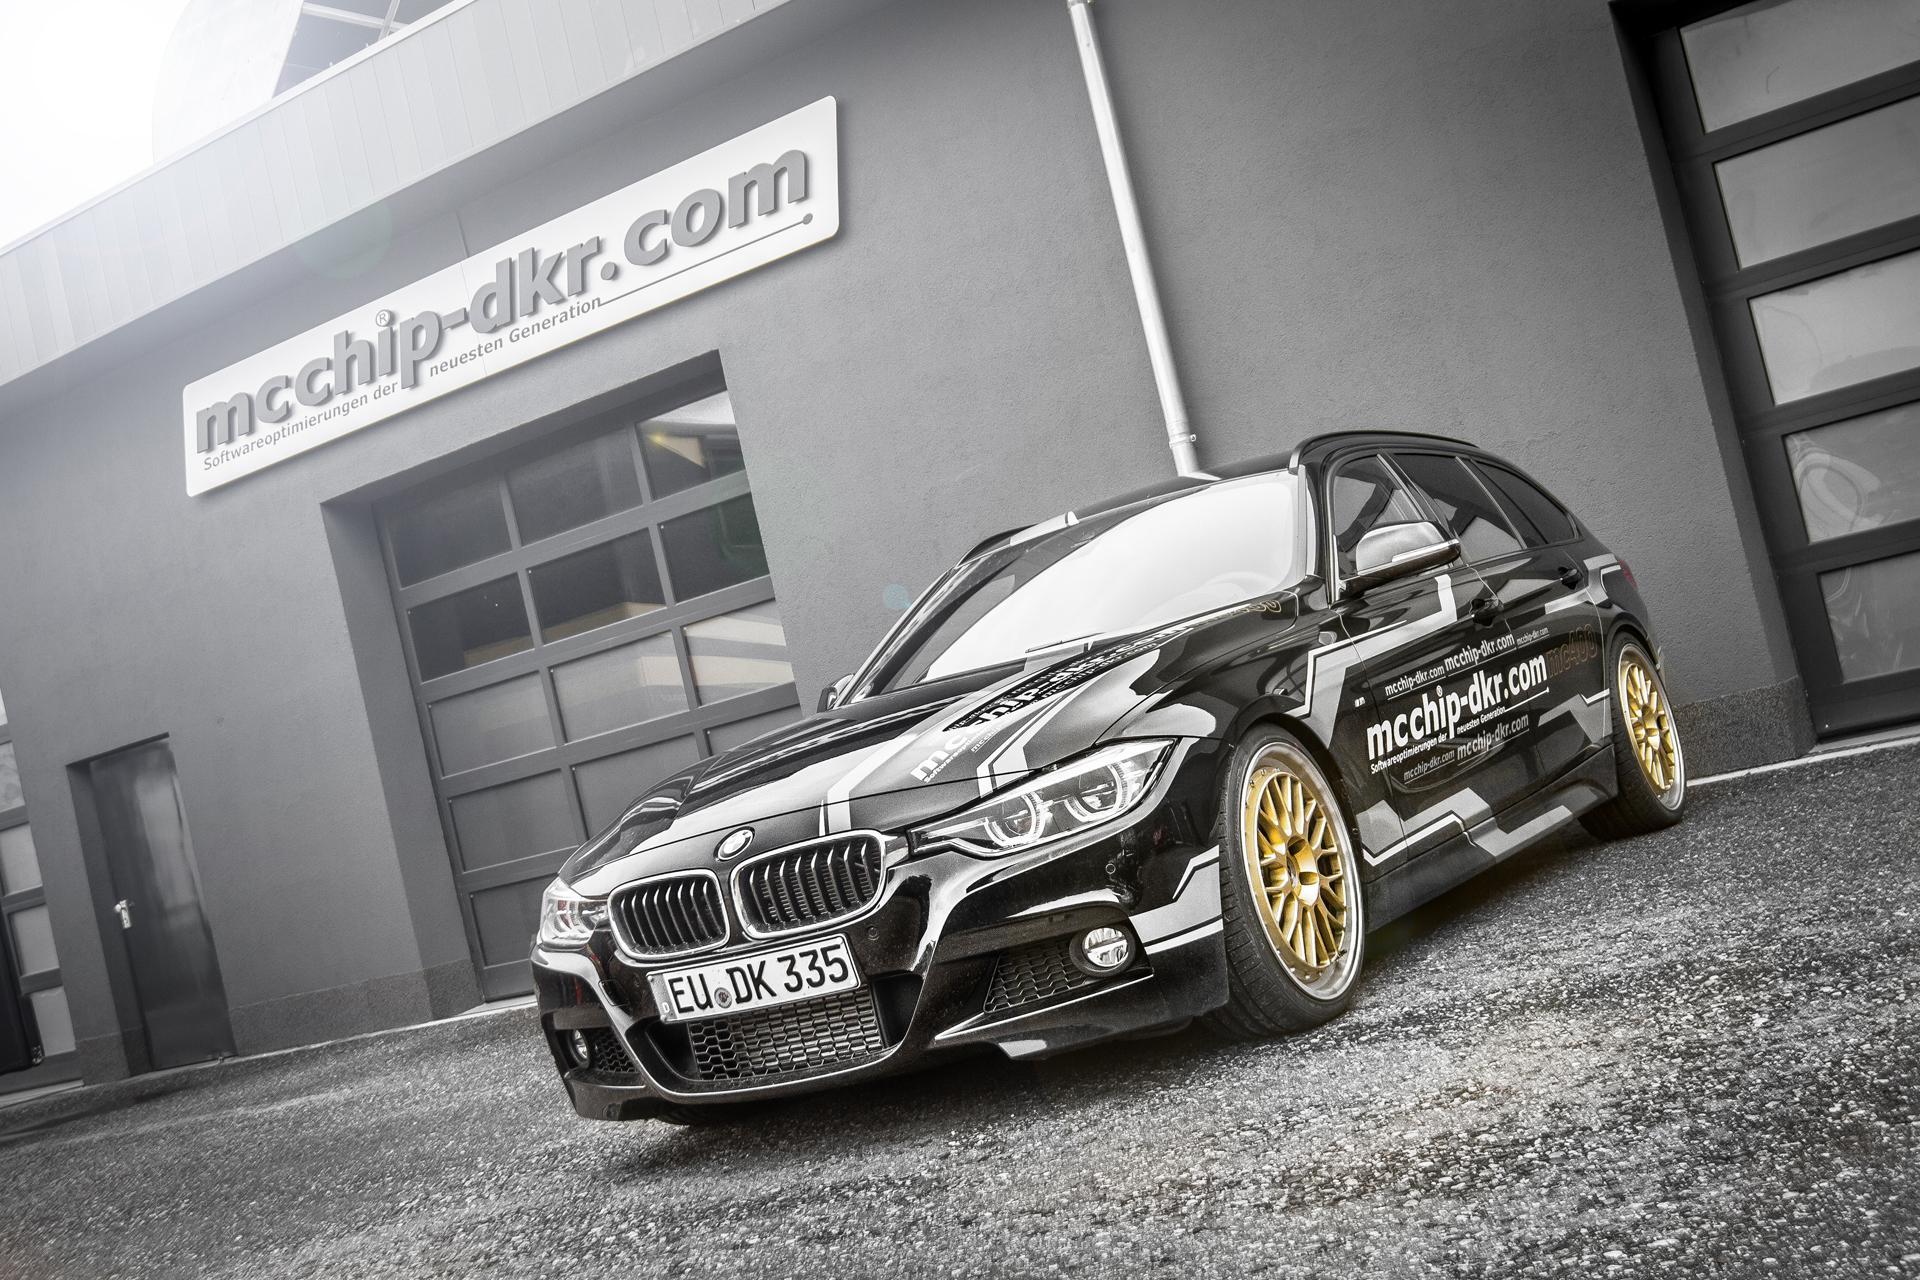 BMW 335d F31 3 0d 'mc400